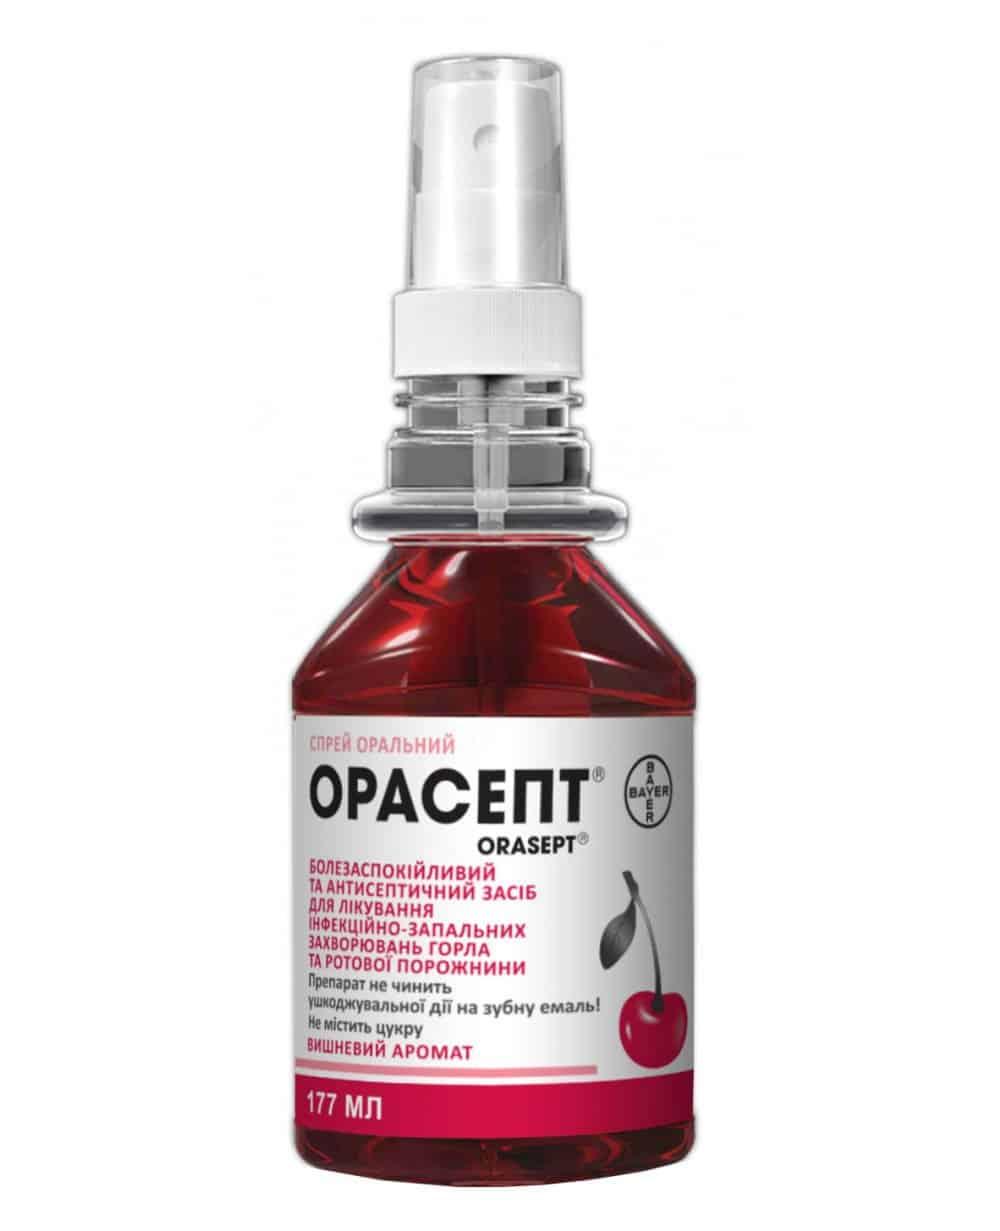 Orasept (phenol) spray 177 ml.